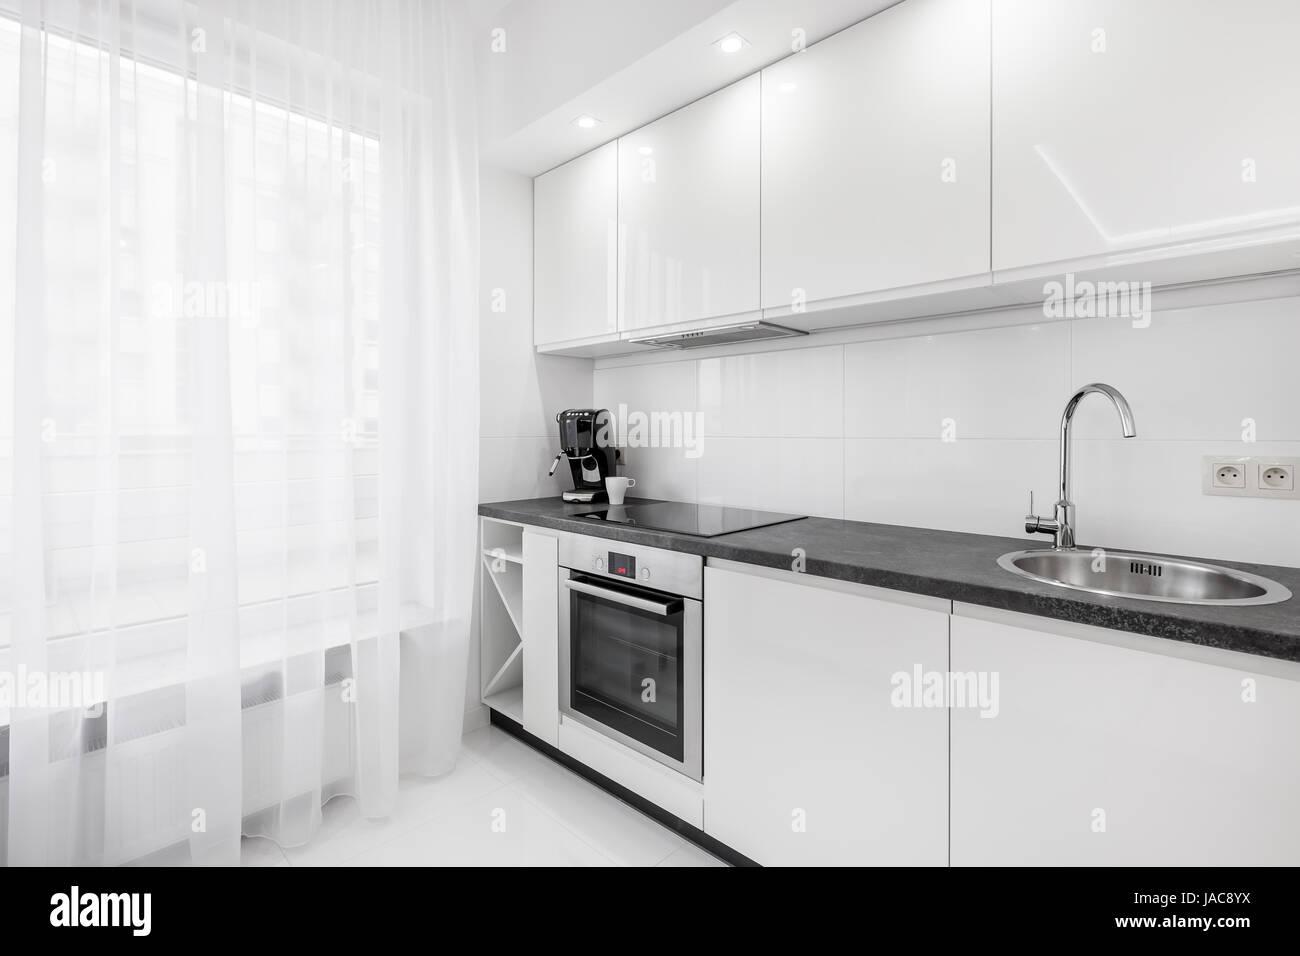 Black Granite Worktop Light Stockfotos & Black Granite Worktop Light ...